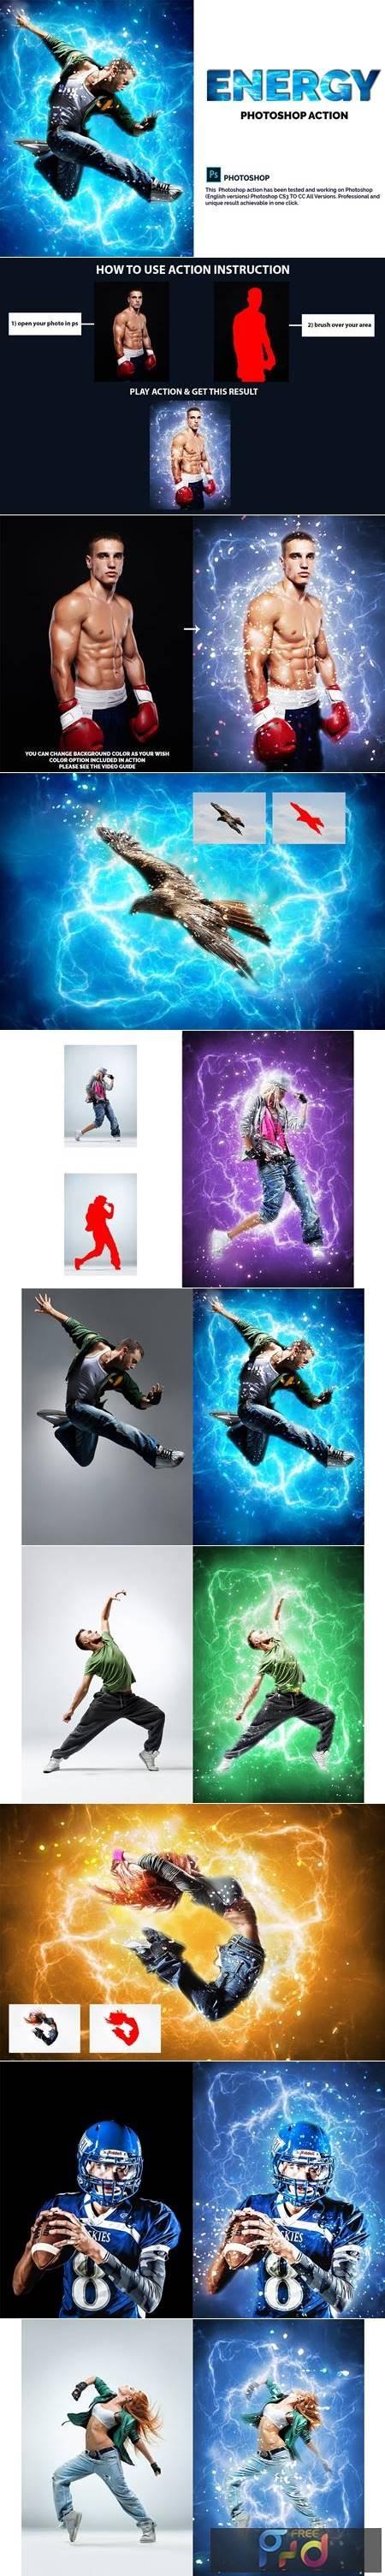 Energy Photoshop Action 4809089 1